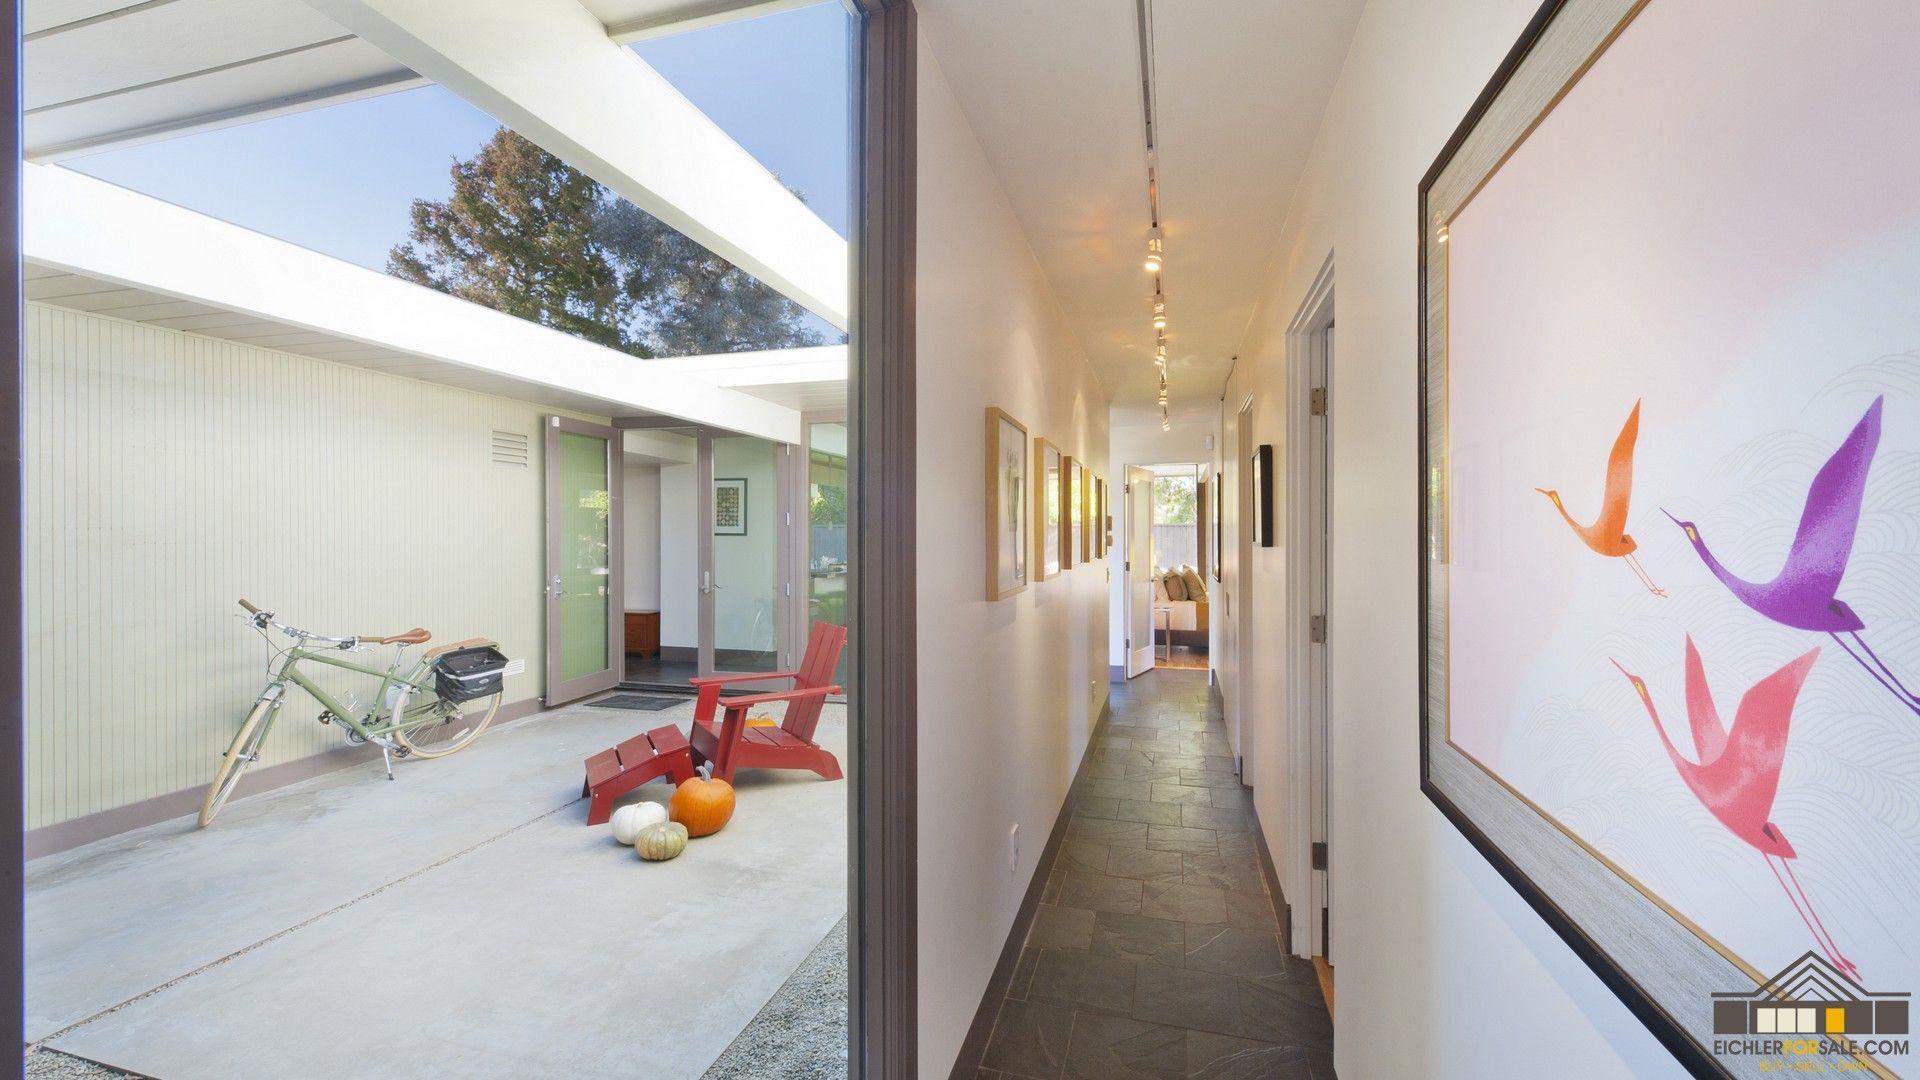 Eichler Atriums Atrium Photo Gallery For Mid Century Modern